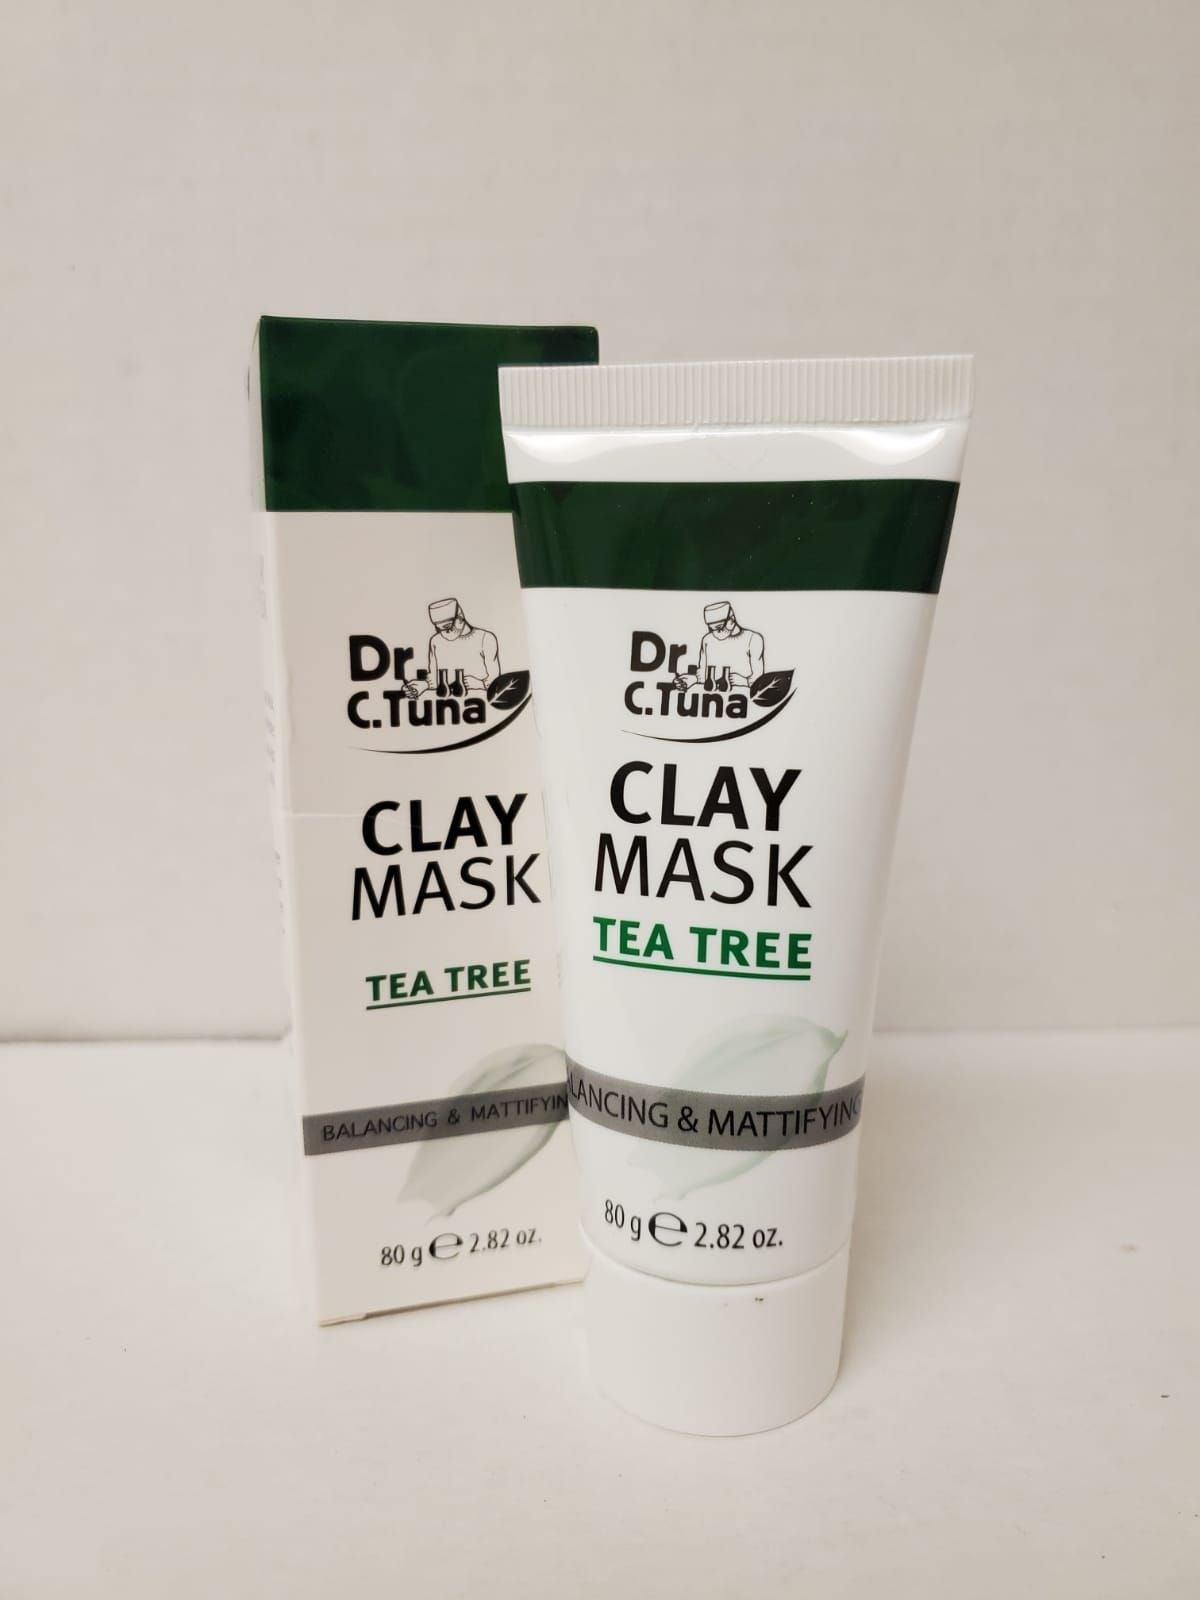 Tea Tree Clay Mask